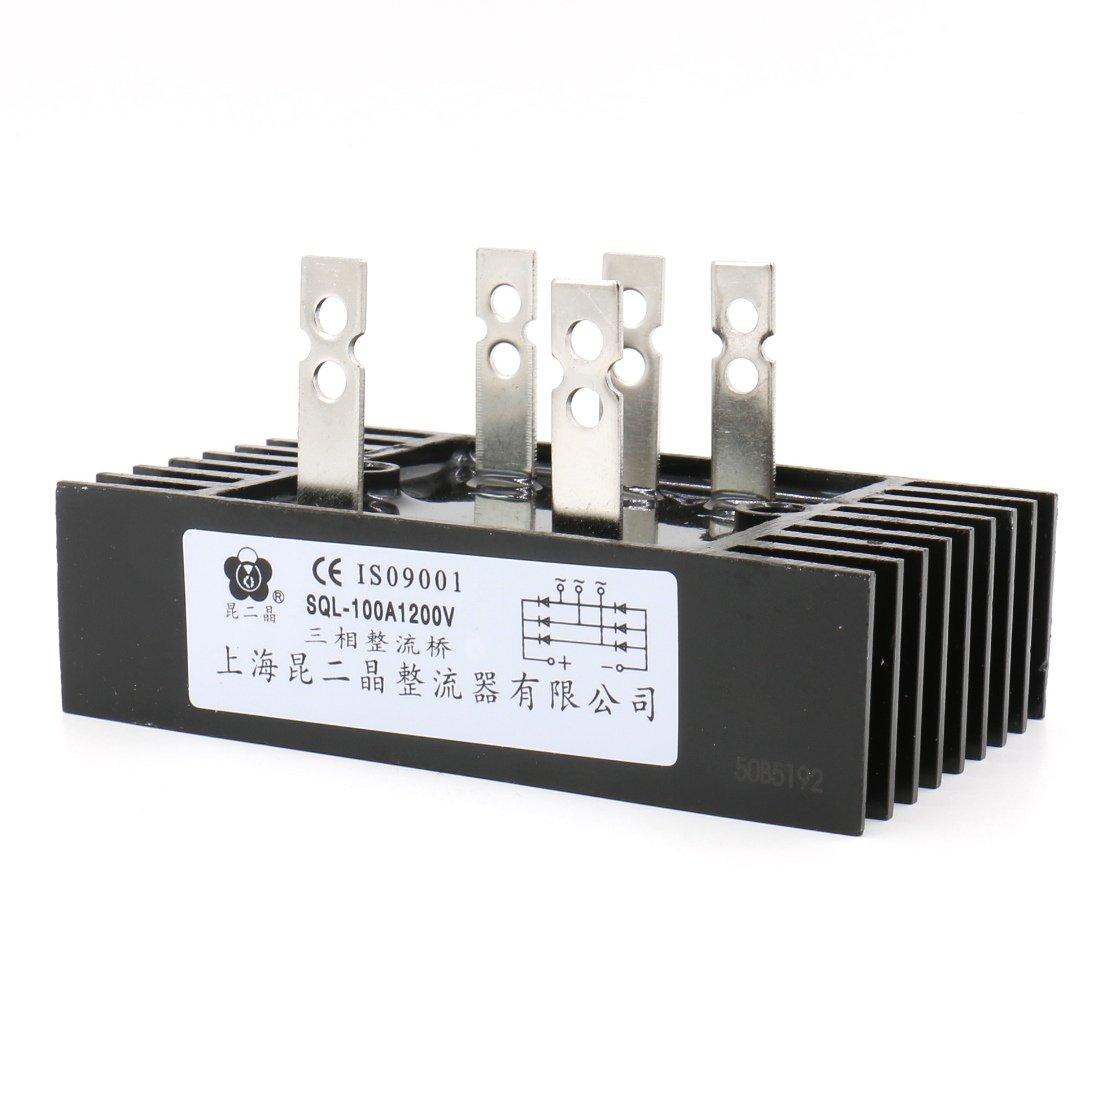 Baomain Heatsink Shape Bridge Rectifier SQL100A 1200V 3 Phase Diode Metal Case